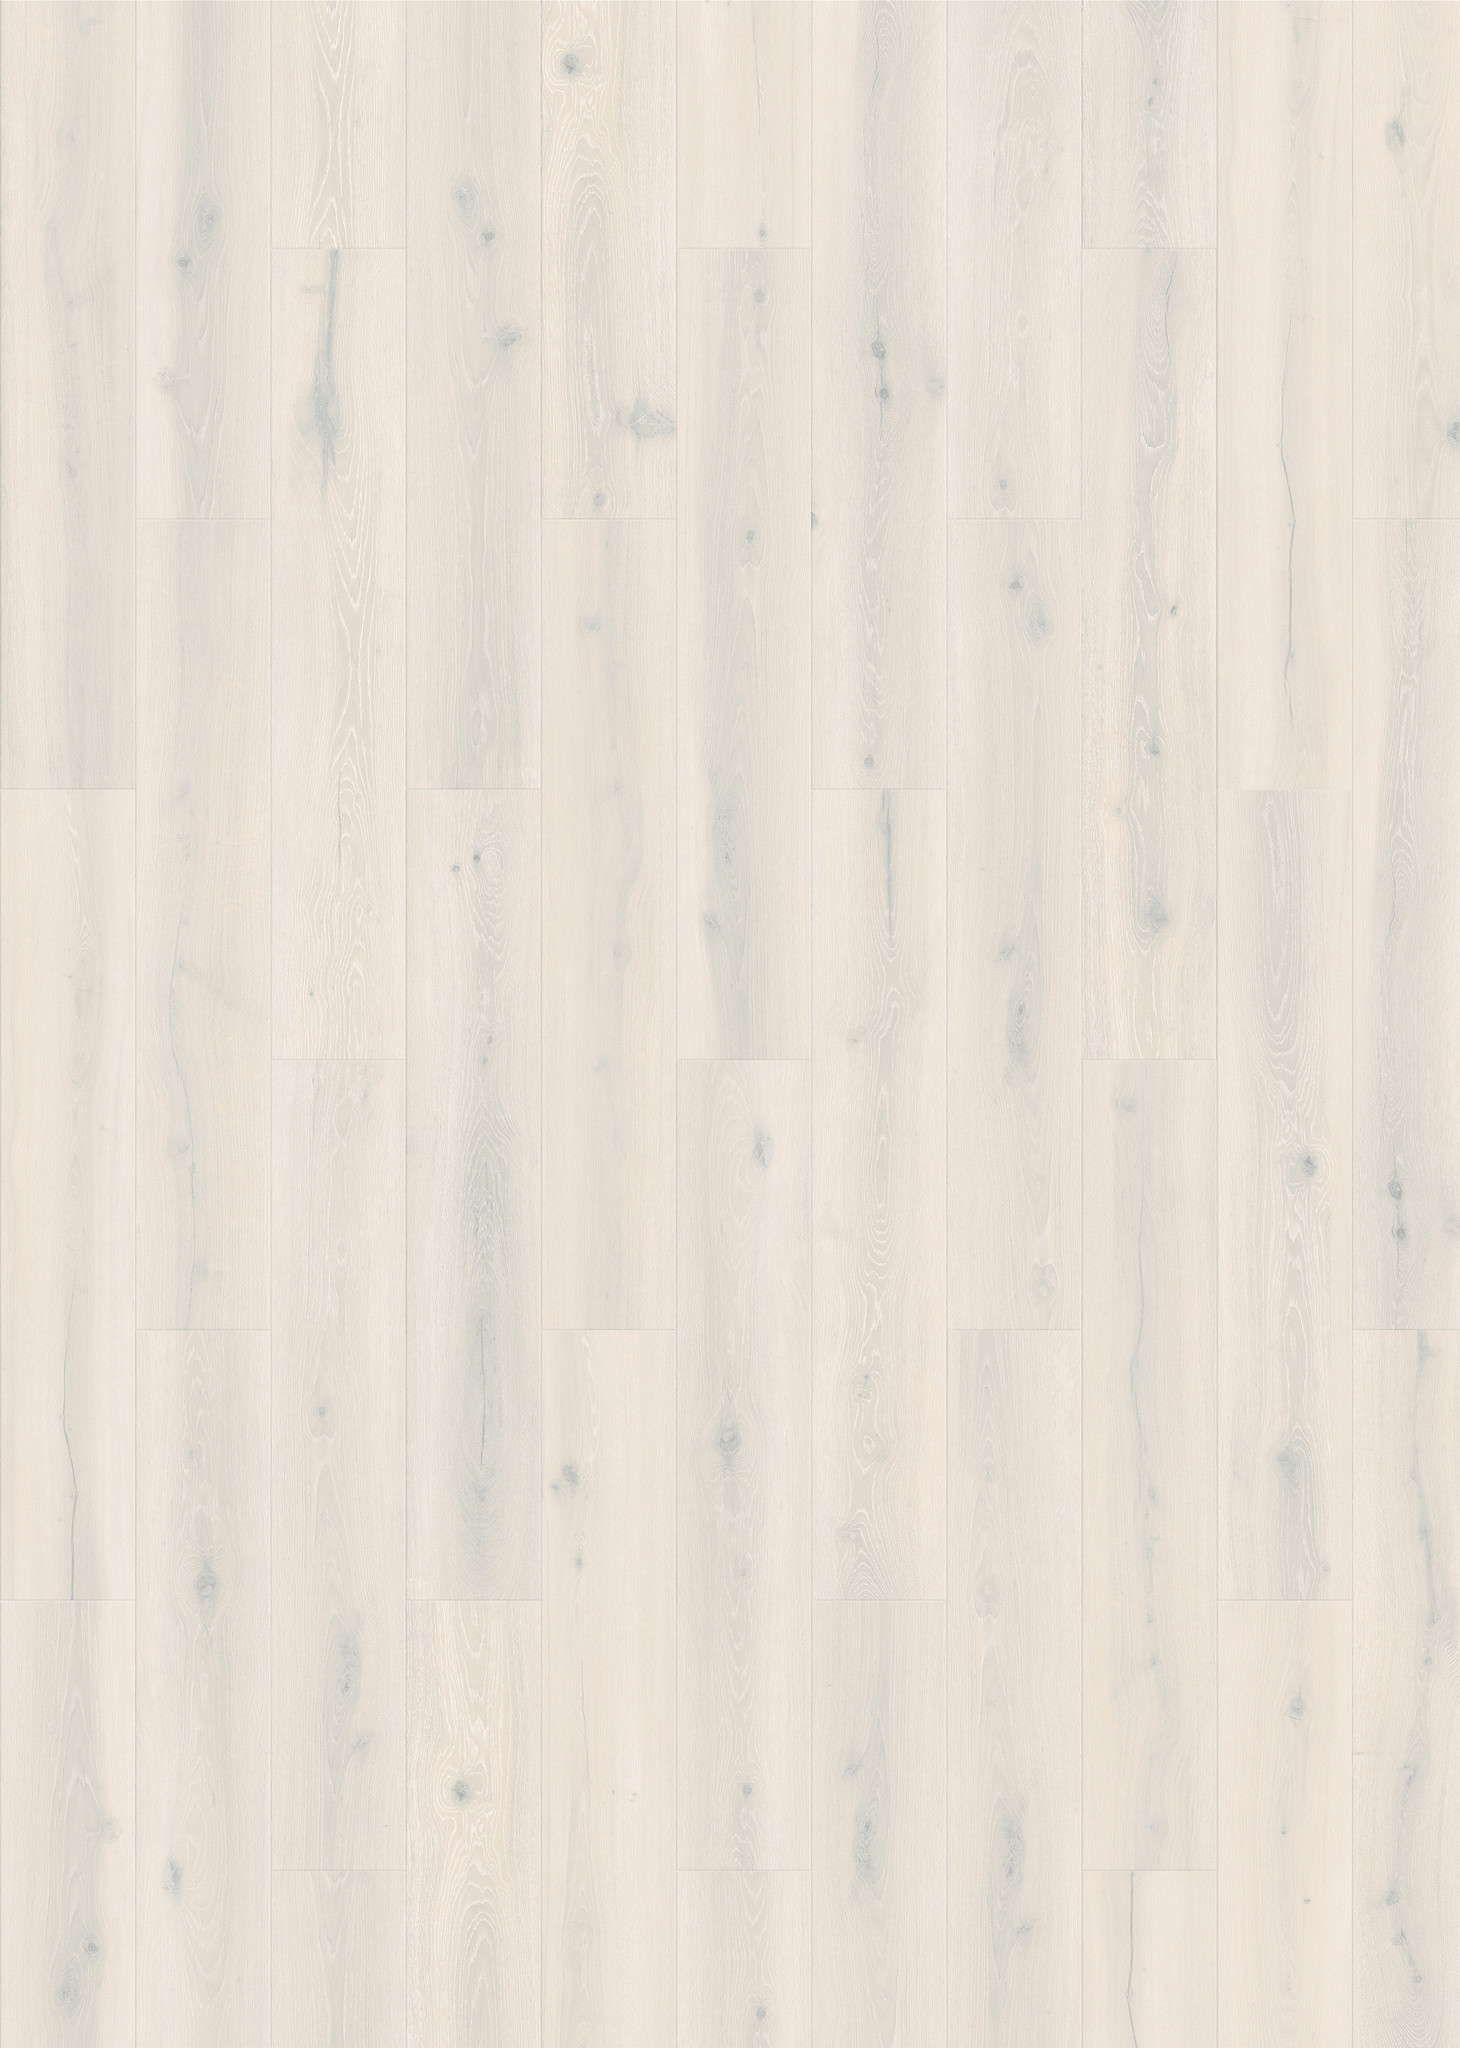 Tarkett Supernature PVC iD Inspiration-3